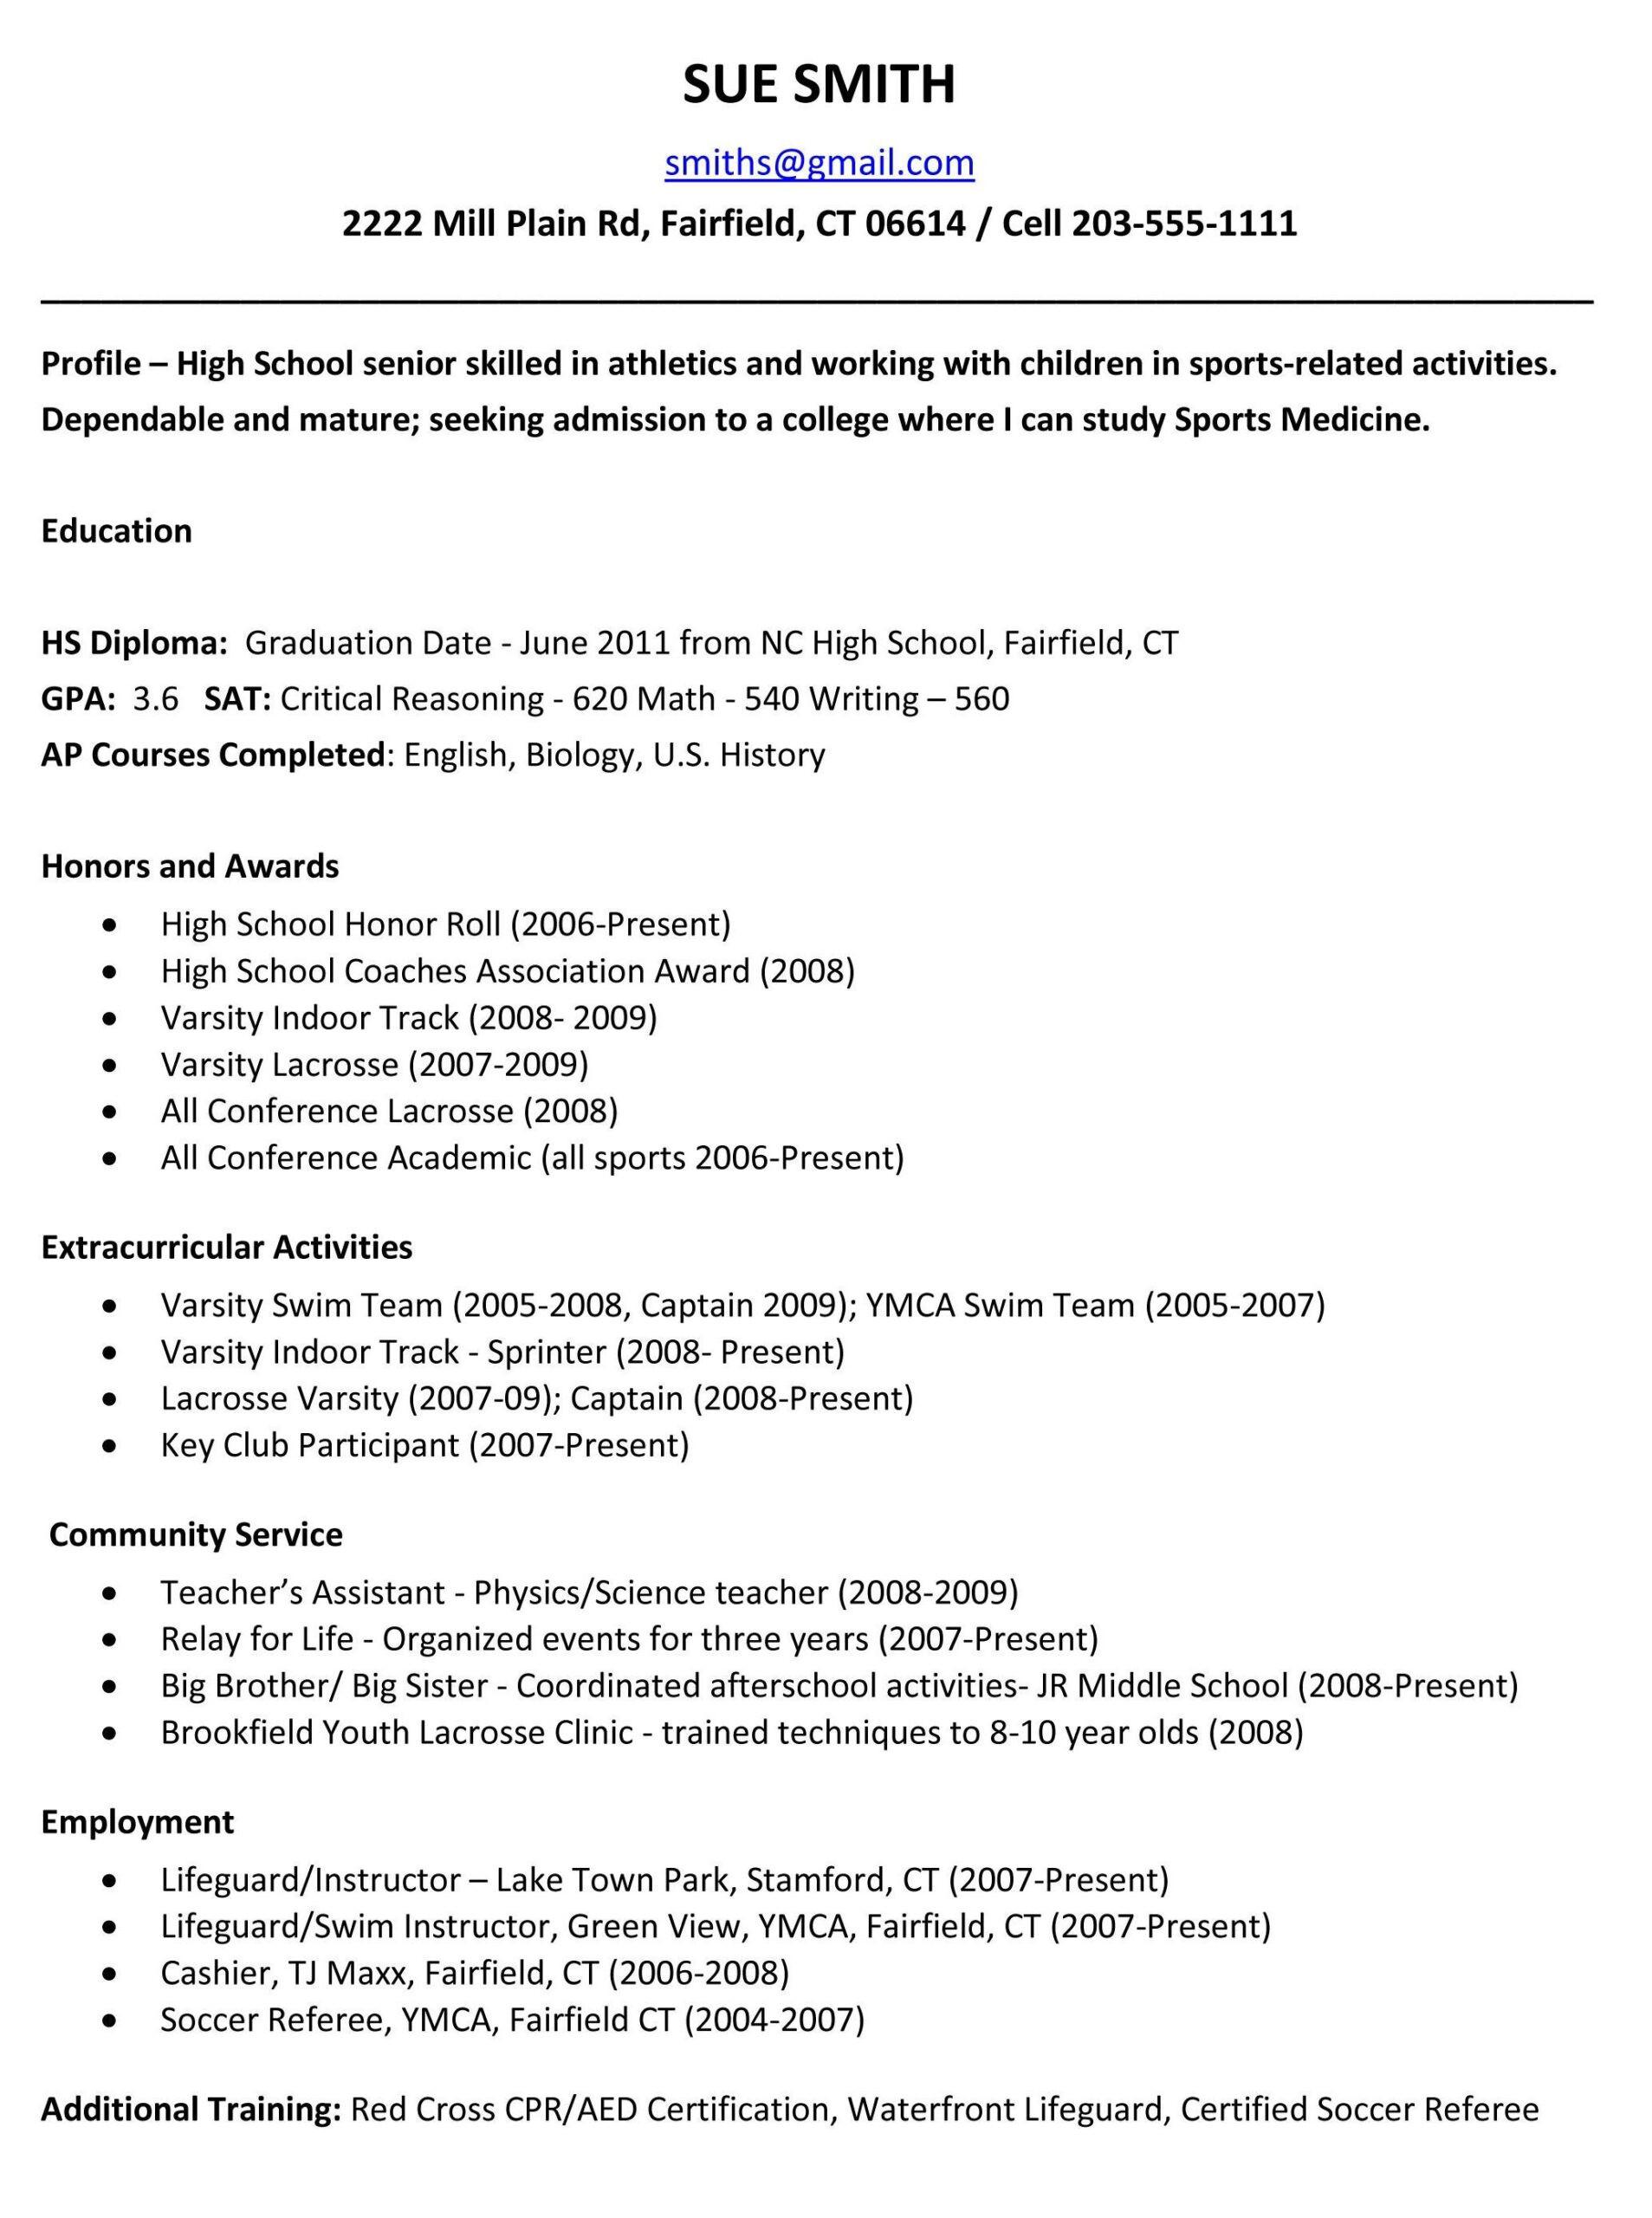 sample resume summary for high school student